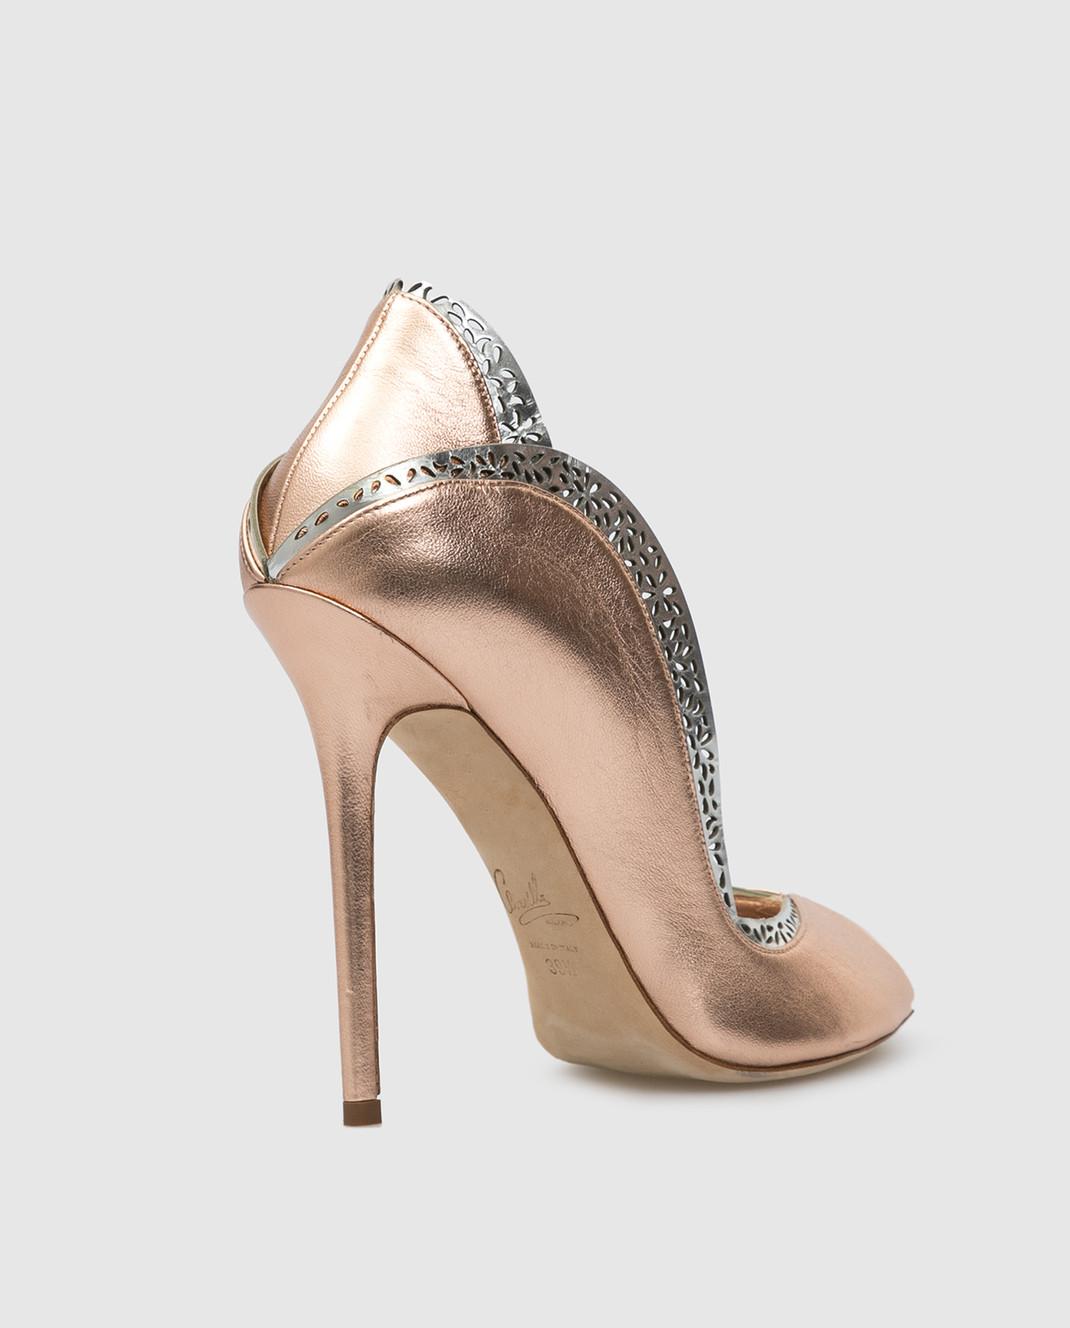 Cerasella Кожаные туфли DANAESPECCHIO изображение 4